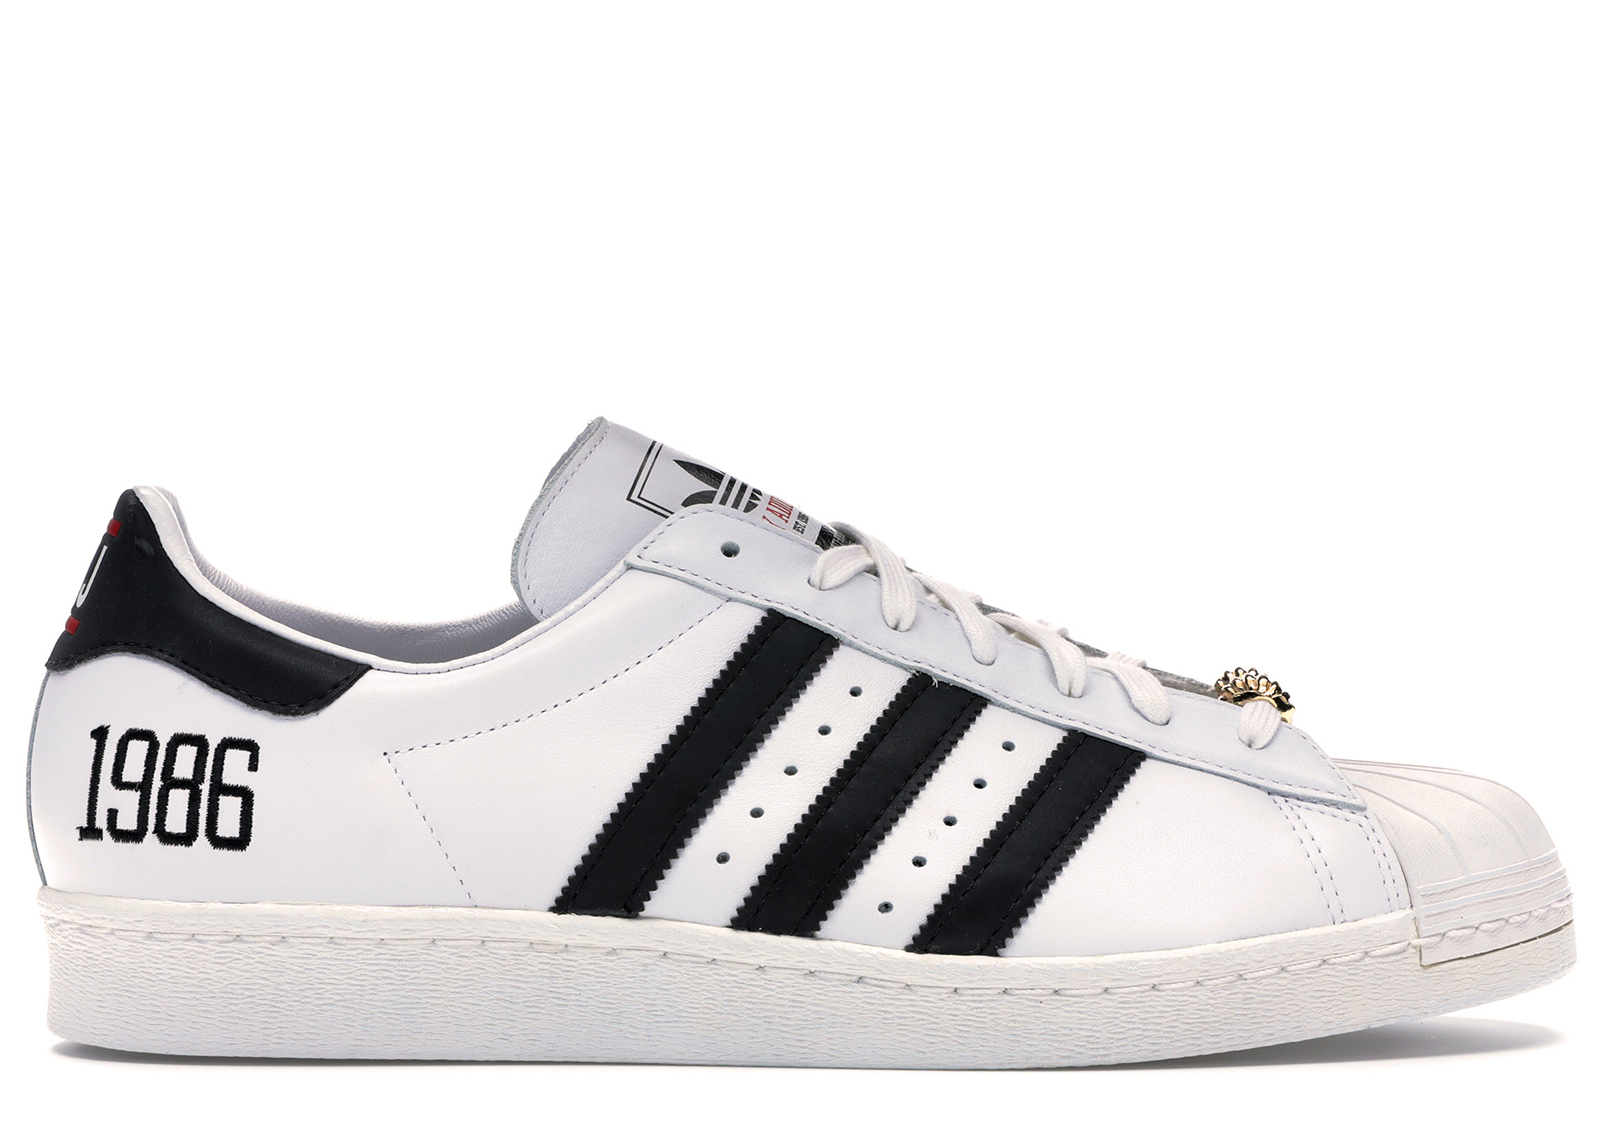 adidas Superstar 80s My adidas Run DMC 25th Anniversary - G48910